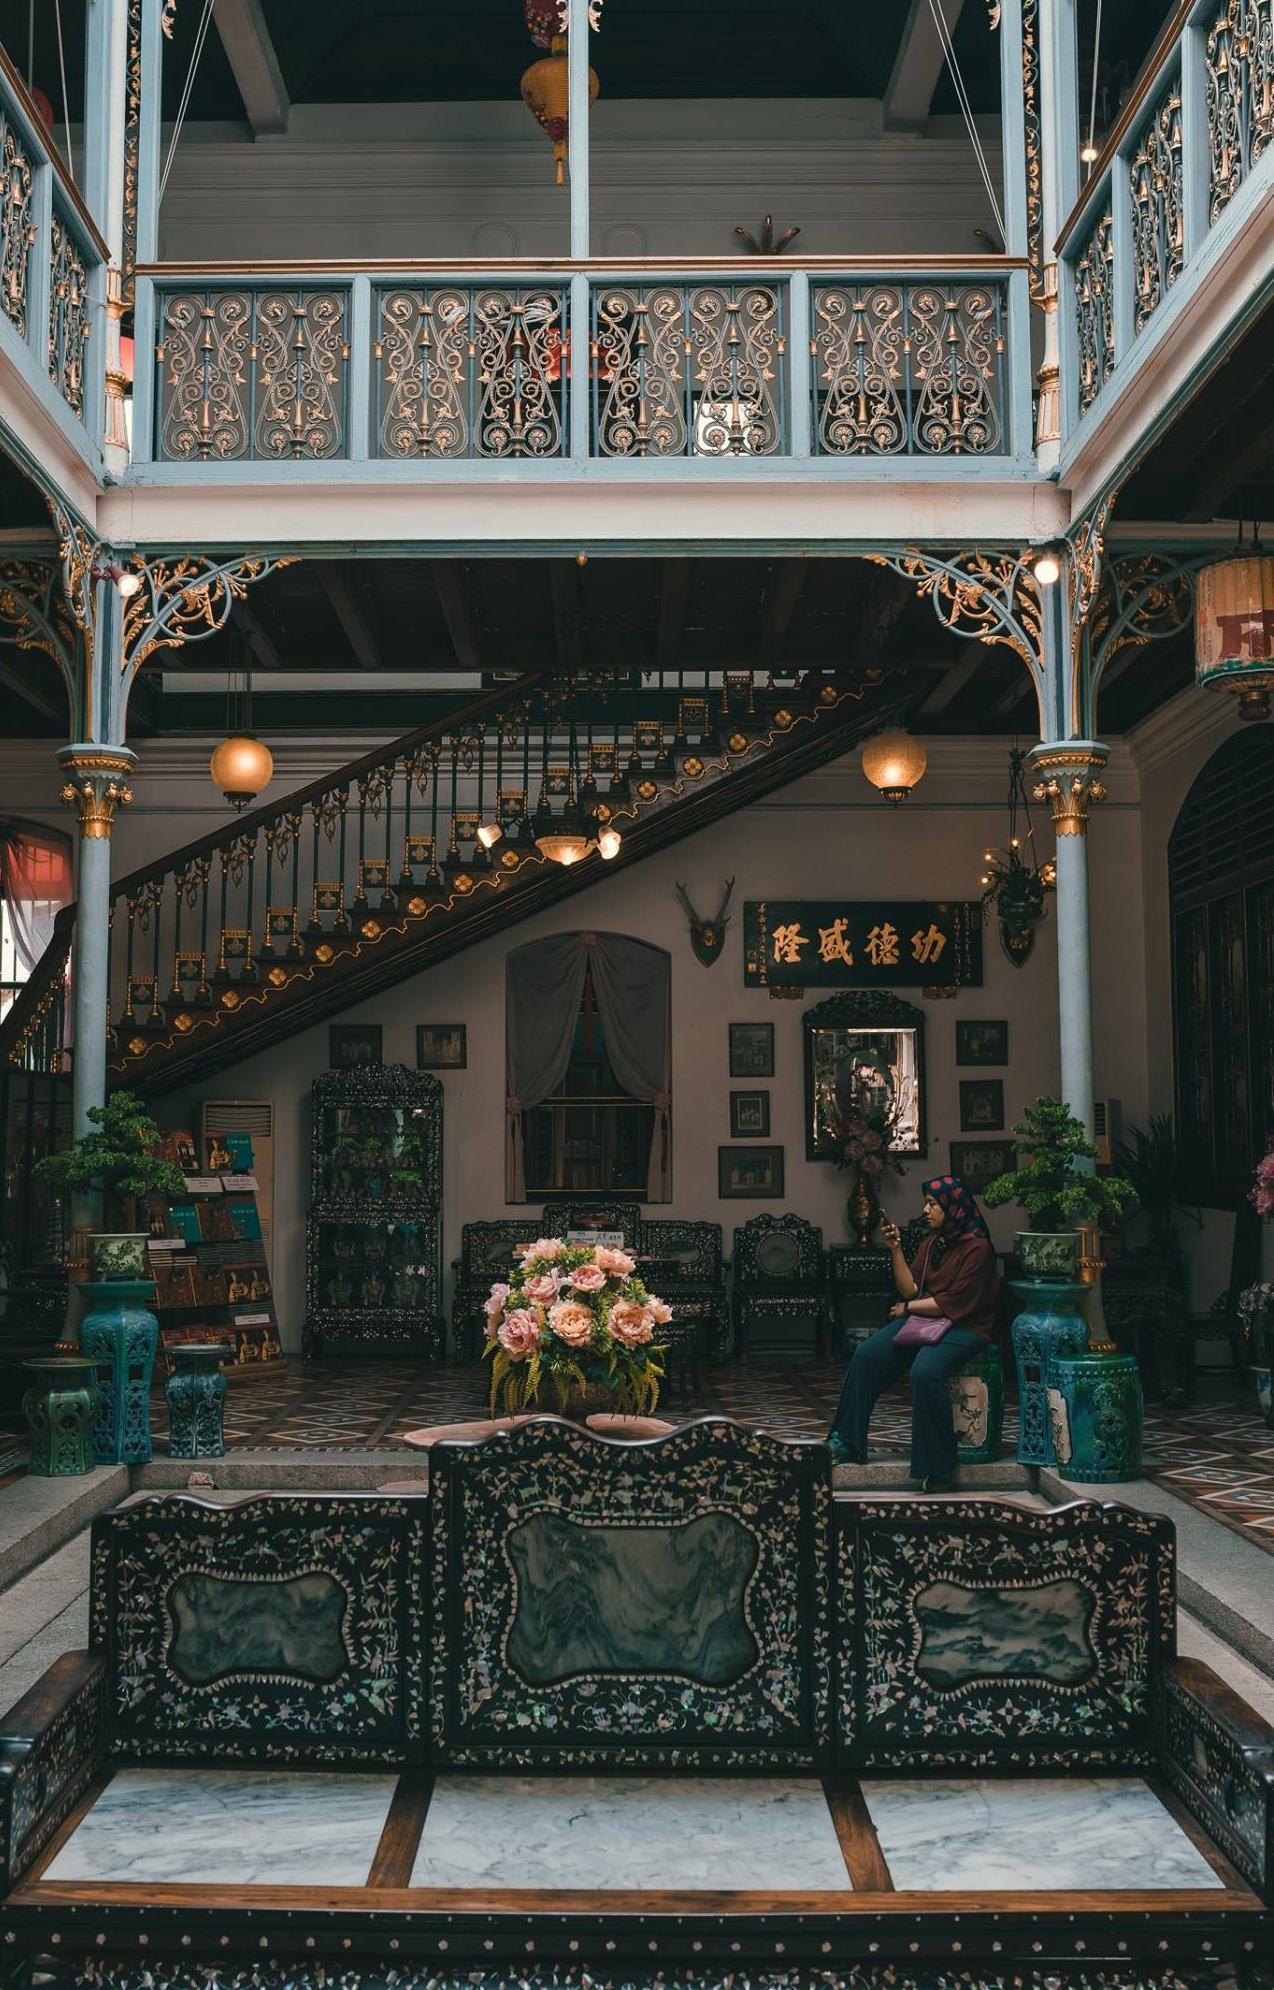 Peranakan Museum - Generations of heritage